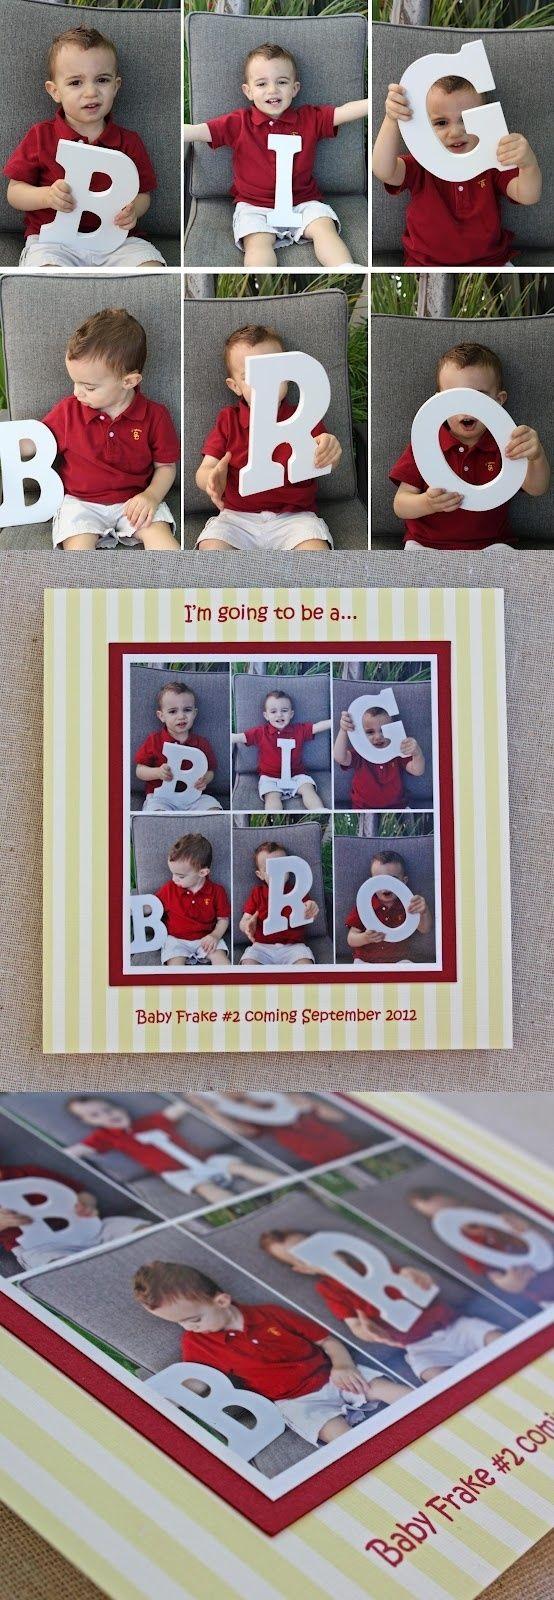 Pregnancy Announcement by Sandra walker